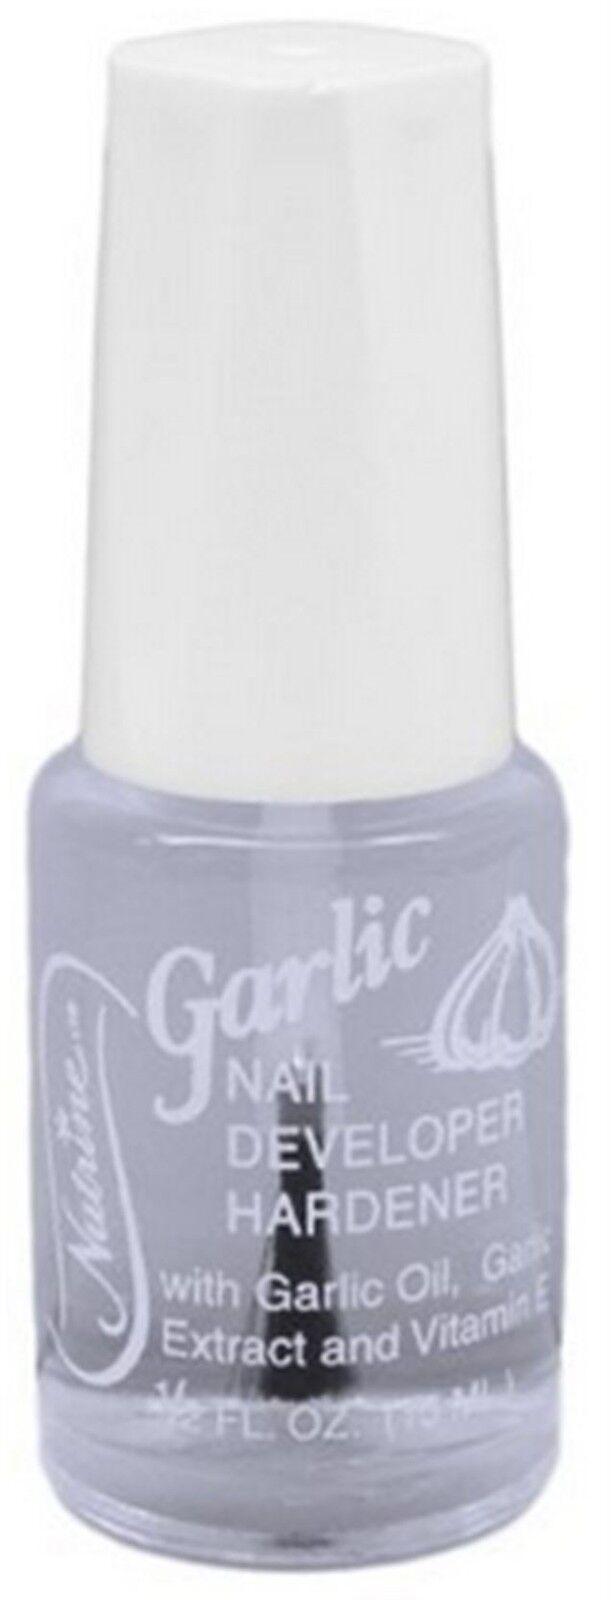 Nutrine Garlic Nail Developer Hardener 0.5 Ounce | eBay